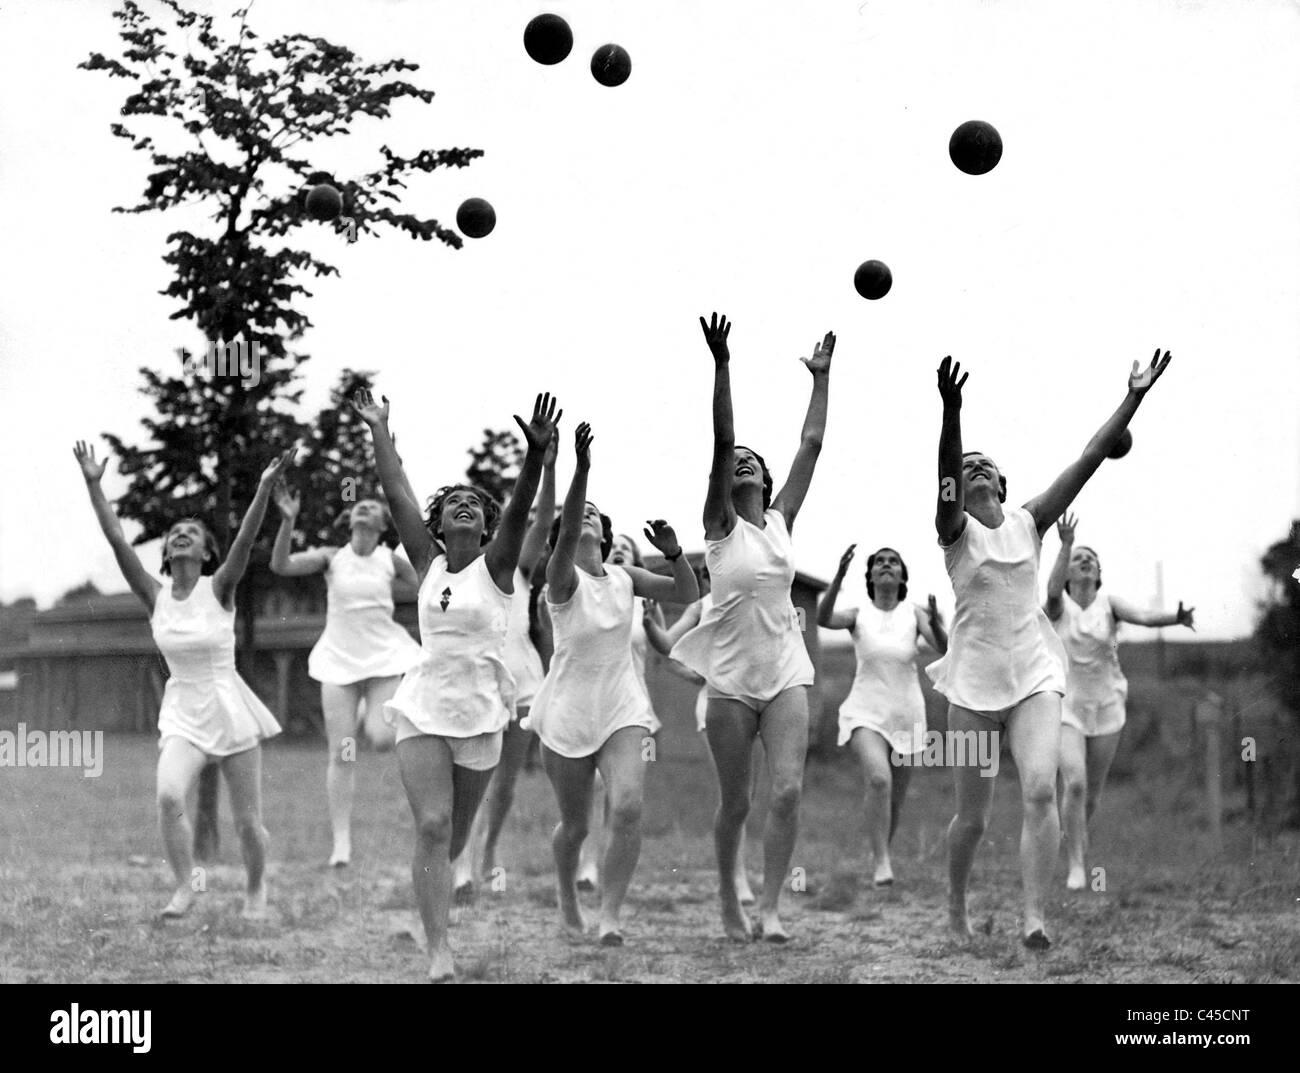 League of German Girls practicing gymnastics - Stock Image